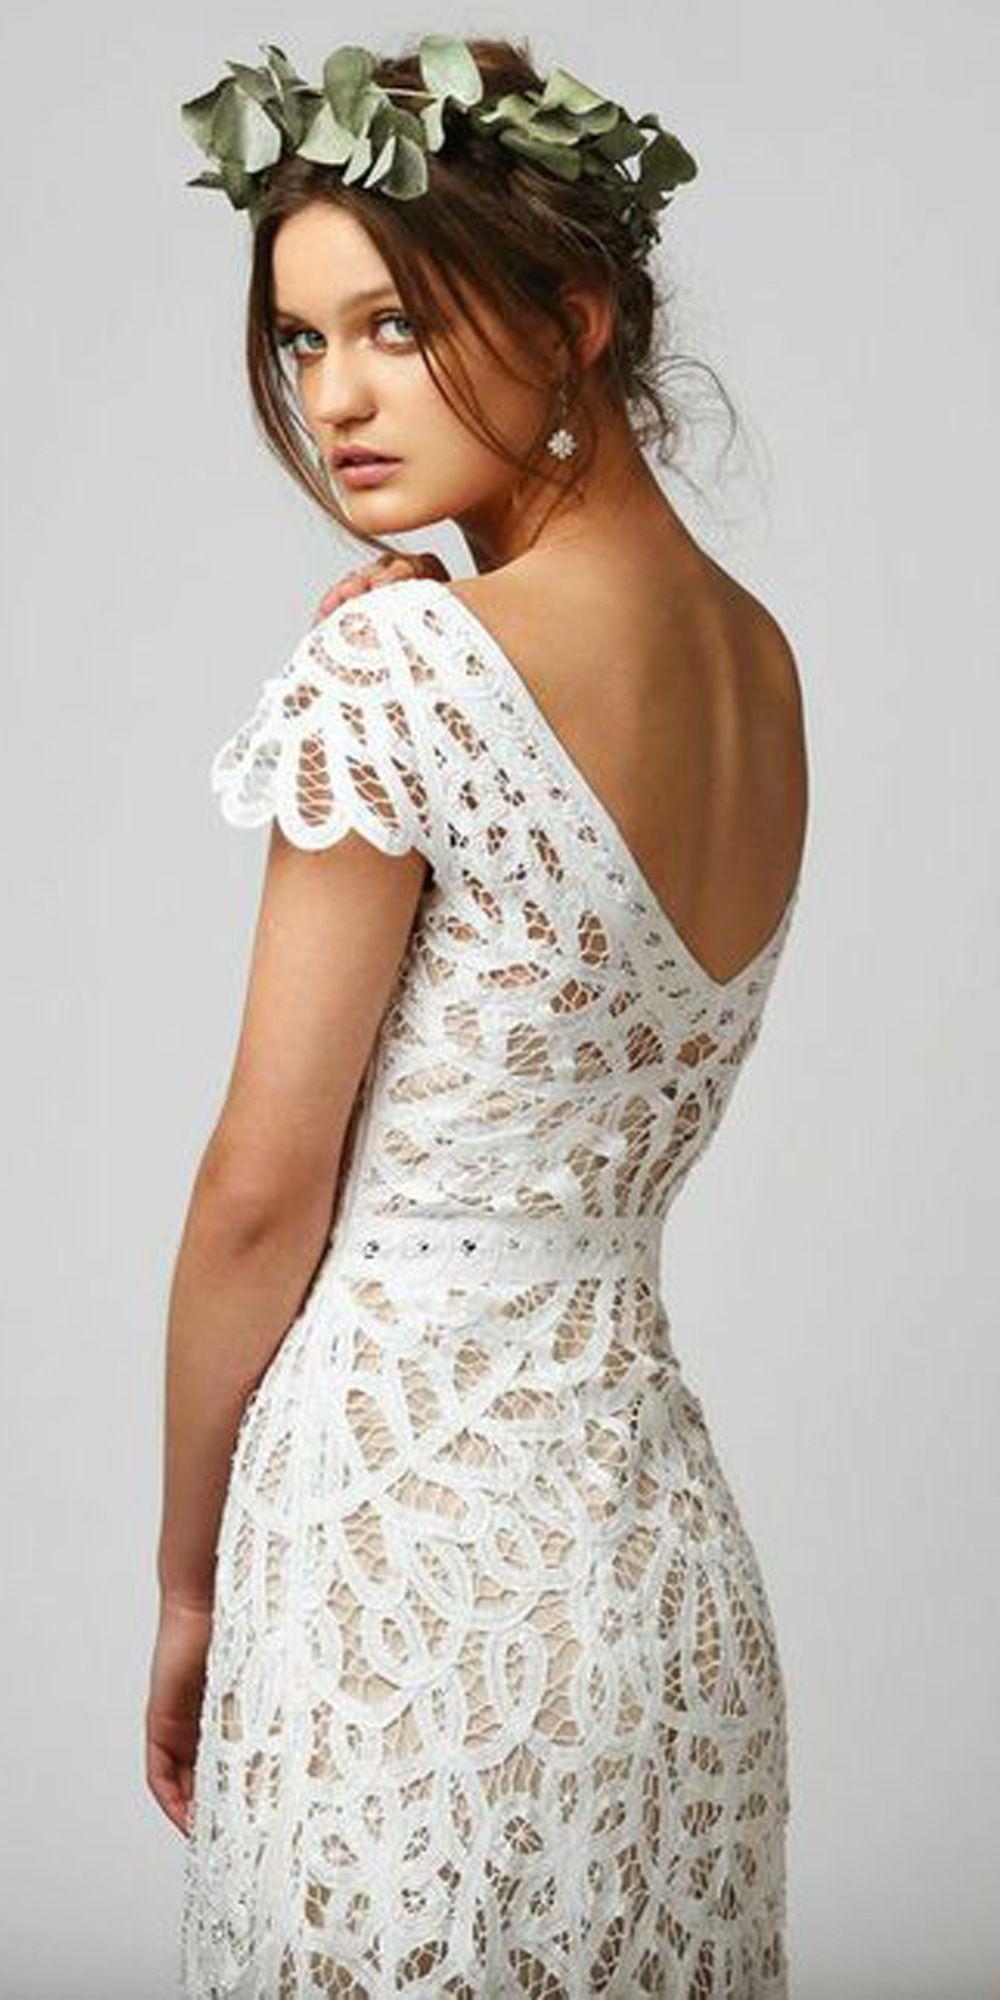 The Violet Dress Features Hand Made Cotton Battenburg Lace Worn Over A Silk Crepe Bias Cut